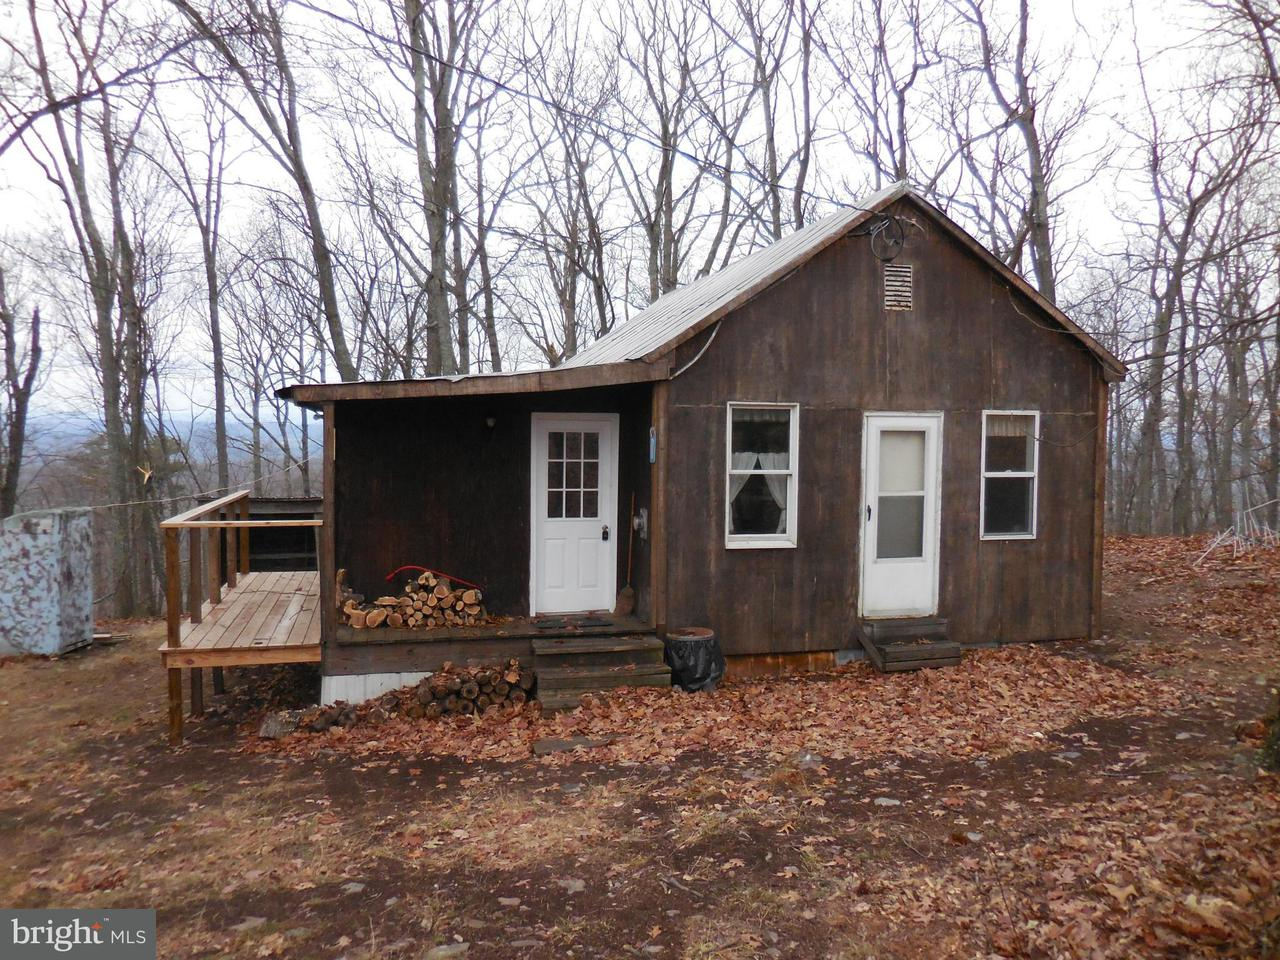 Land for Sale at Off Spring Gap Rd Slanesville, West Virginia 25444 United States